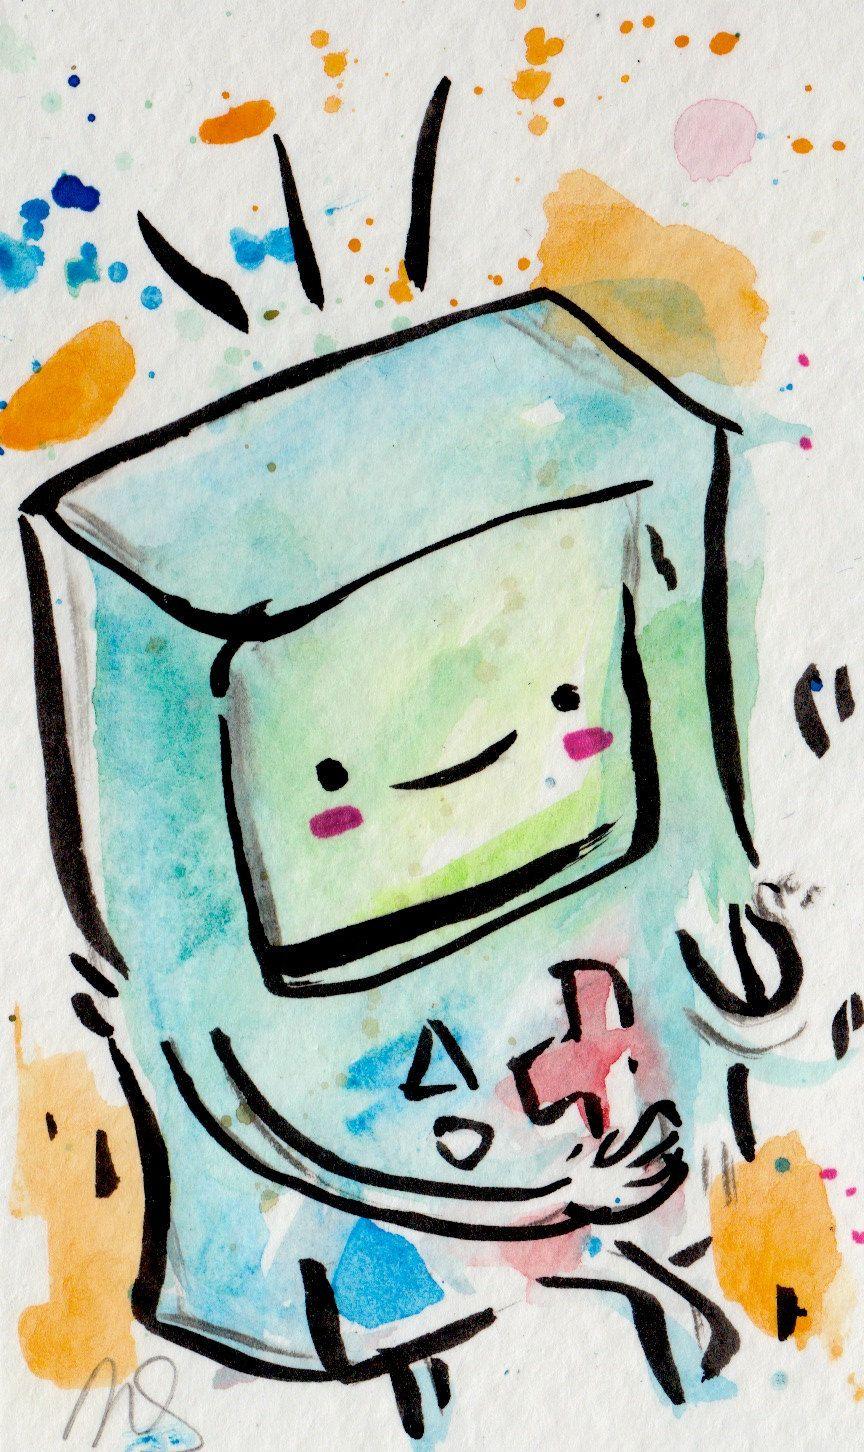 Original Painting Bmo Beemo Adventure Time Fan Art 10 00 Via Etsy Adventure Time Adventure Time Characters Adventure Time Art